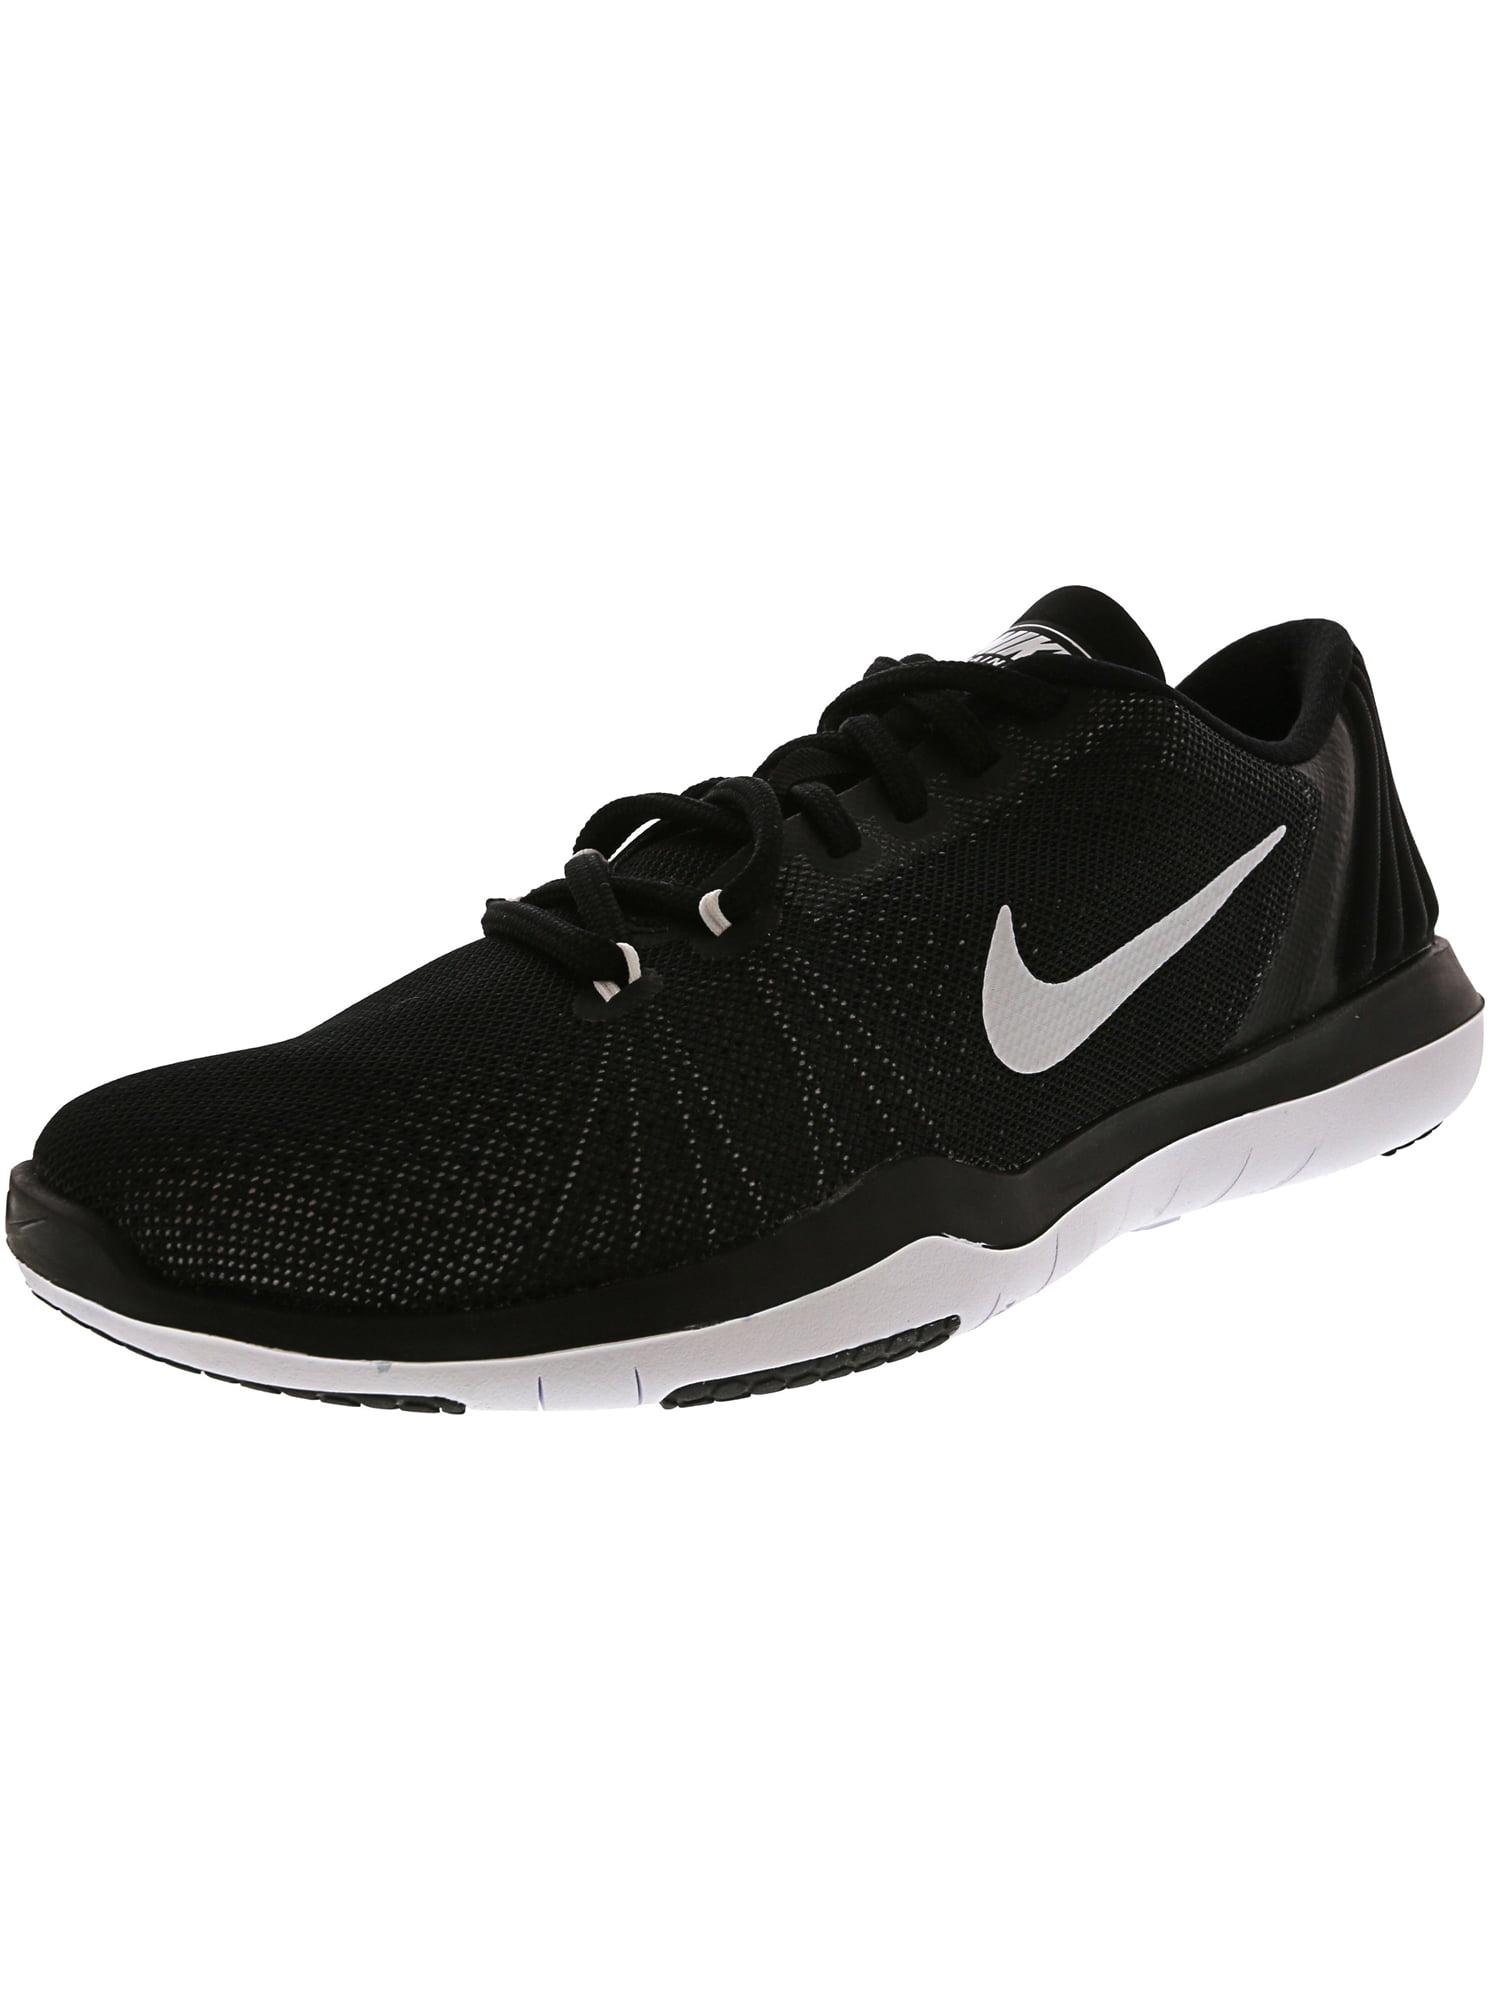 Nike Women's Flex Supreme Tr 5 Black